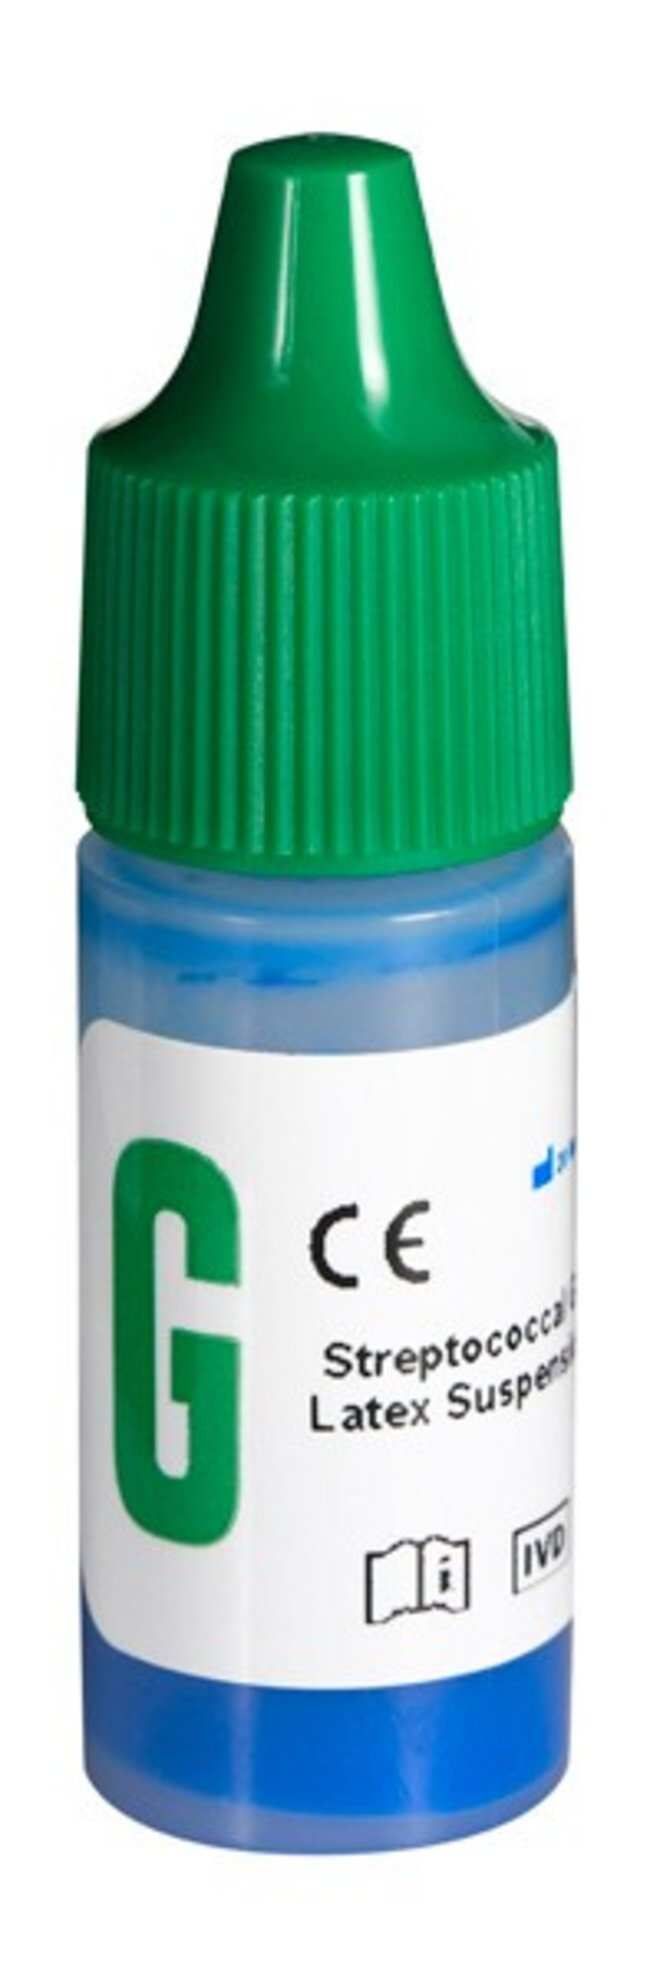 Pro-Lab Diagnostics™Prolex™ Streptococcal Grouping Latex Kits Group G Streptococcal Latex Reagent Pro-Lab Diagnostics™Prolex™ Streptococcal Grouping Latex Kits